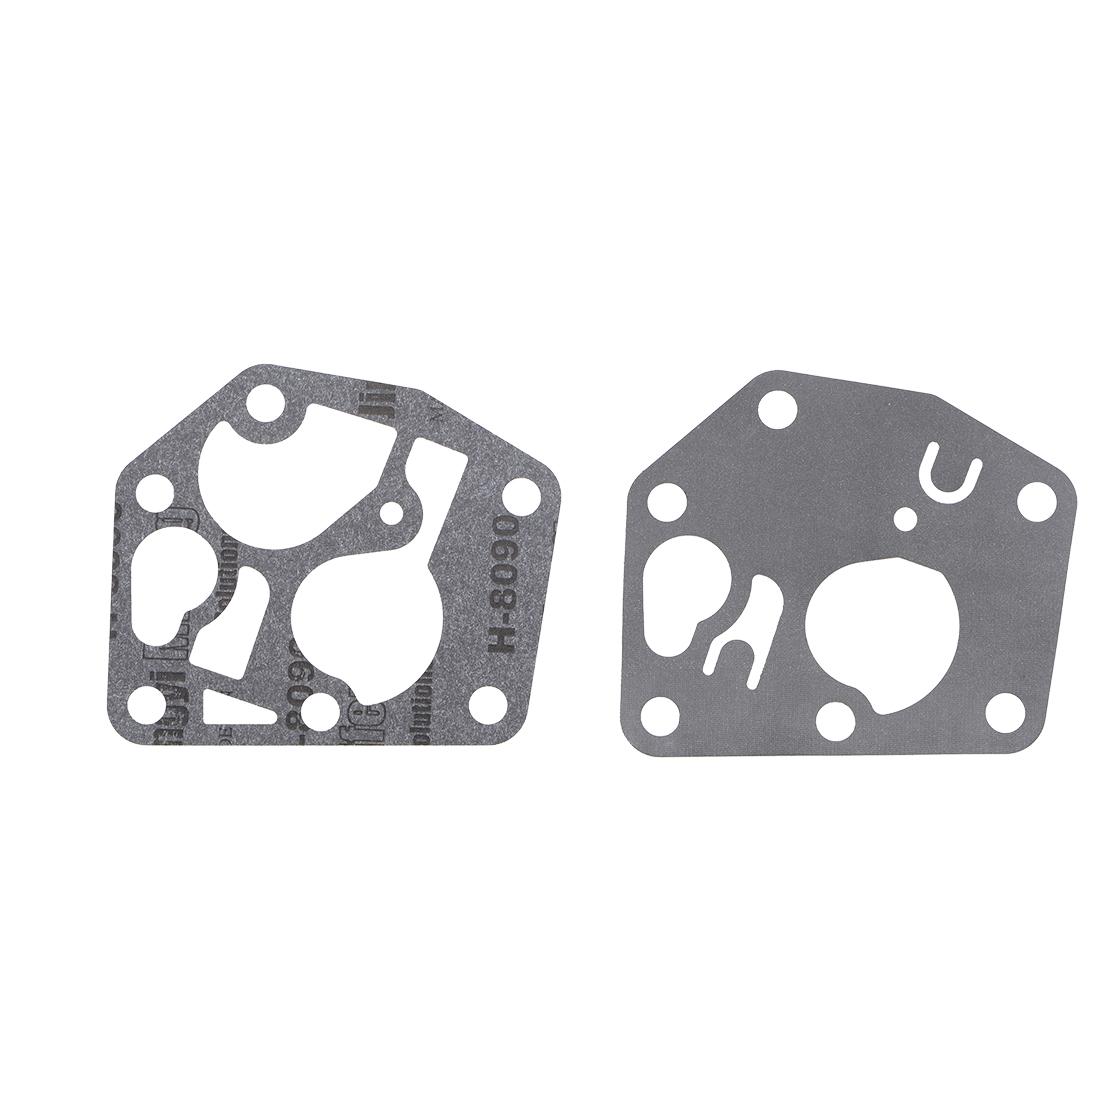 495770 Carburetor Rebuild Kit for Briggs Stratton 495770 795083 95900 96900